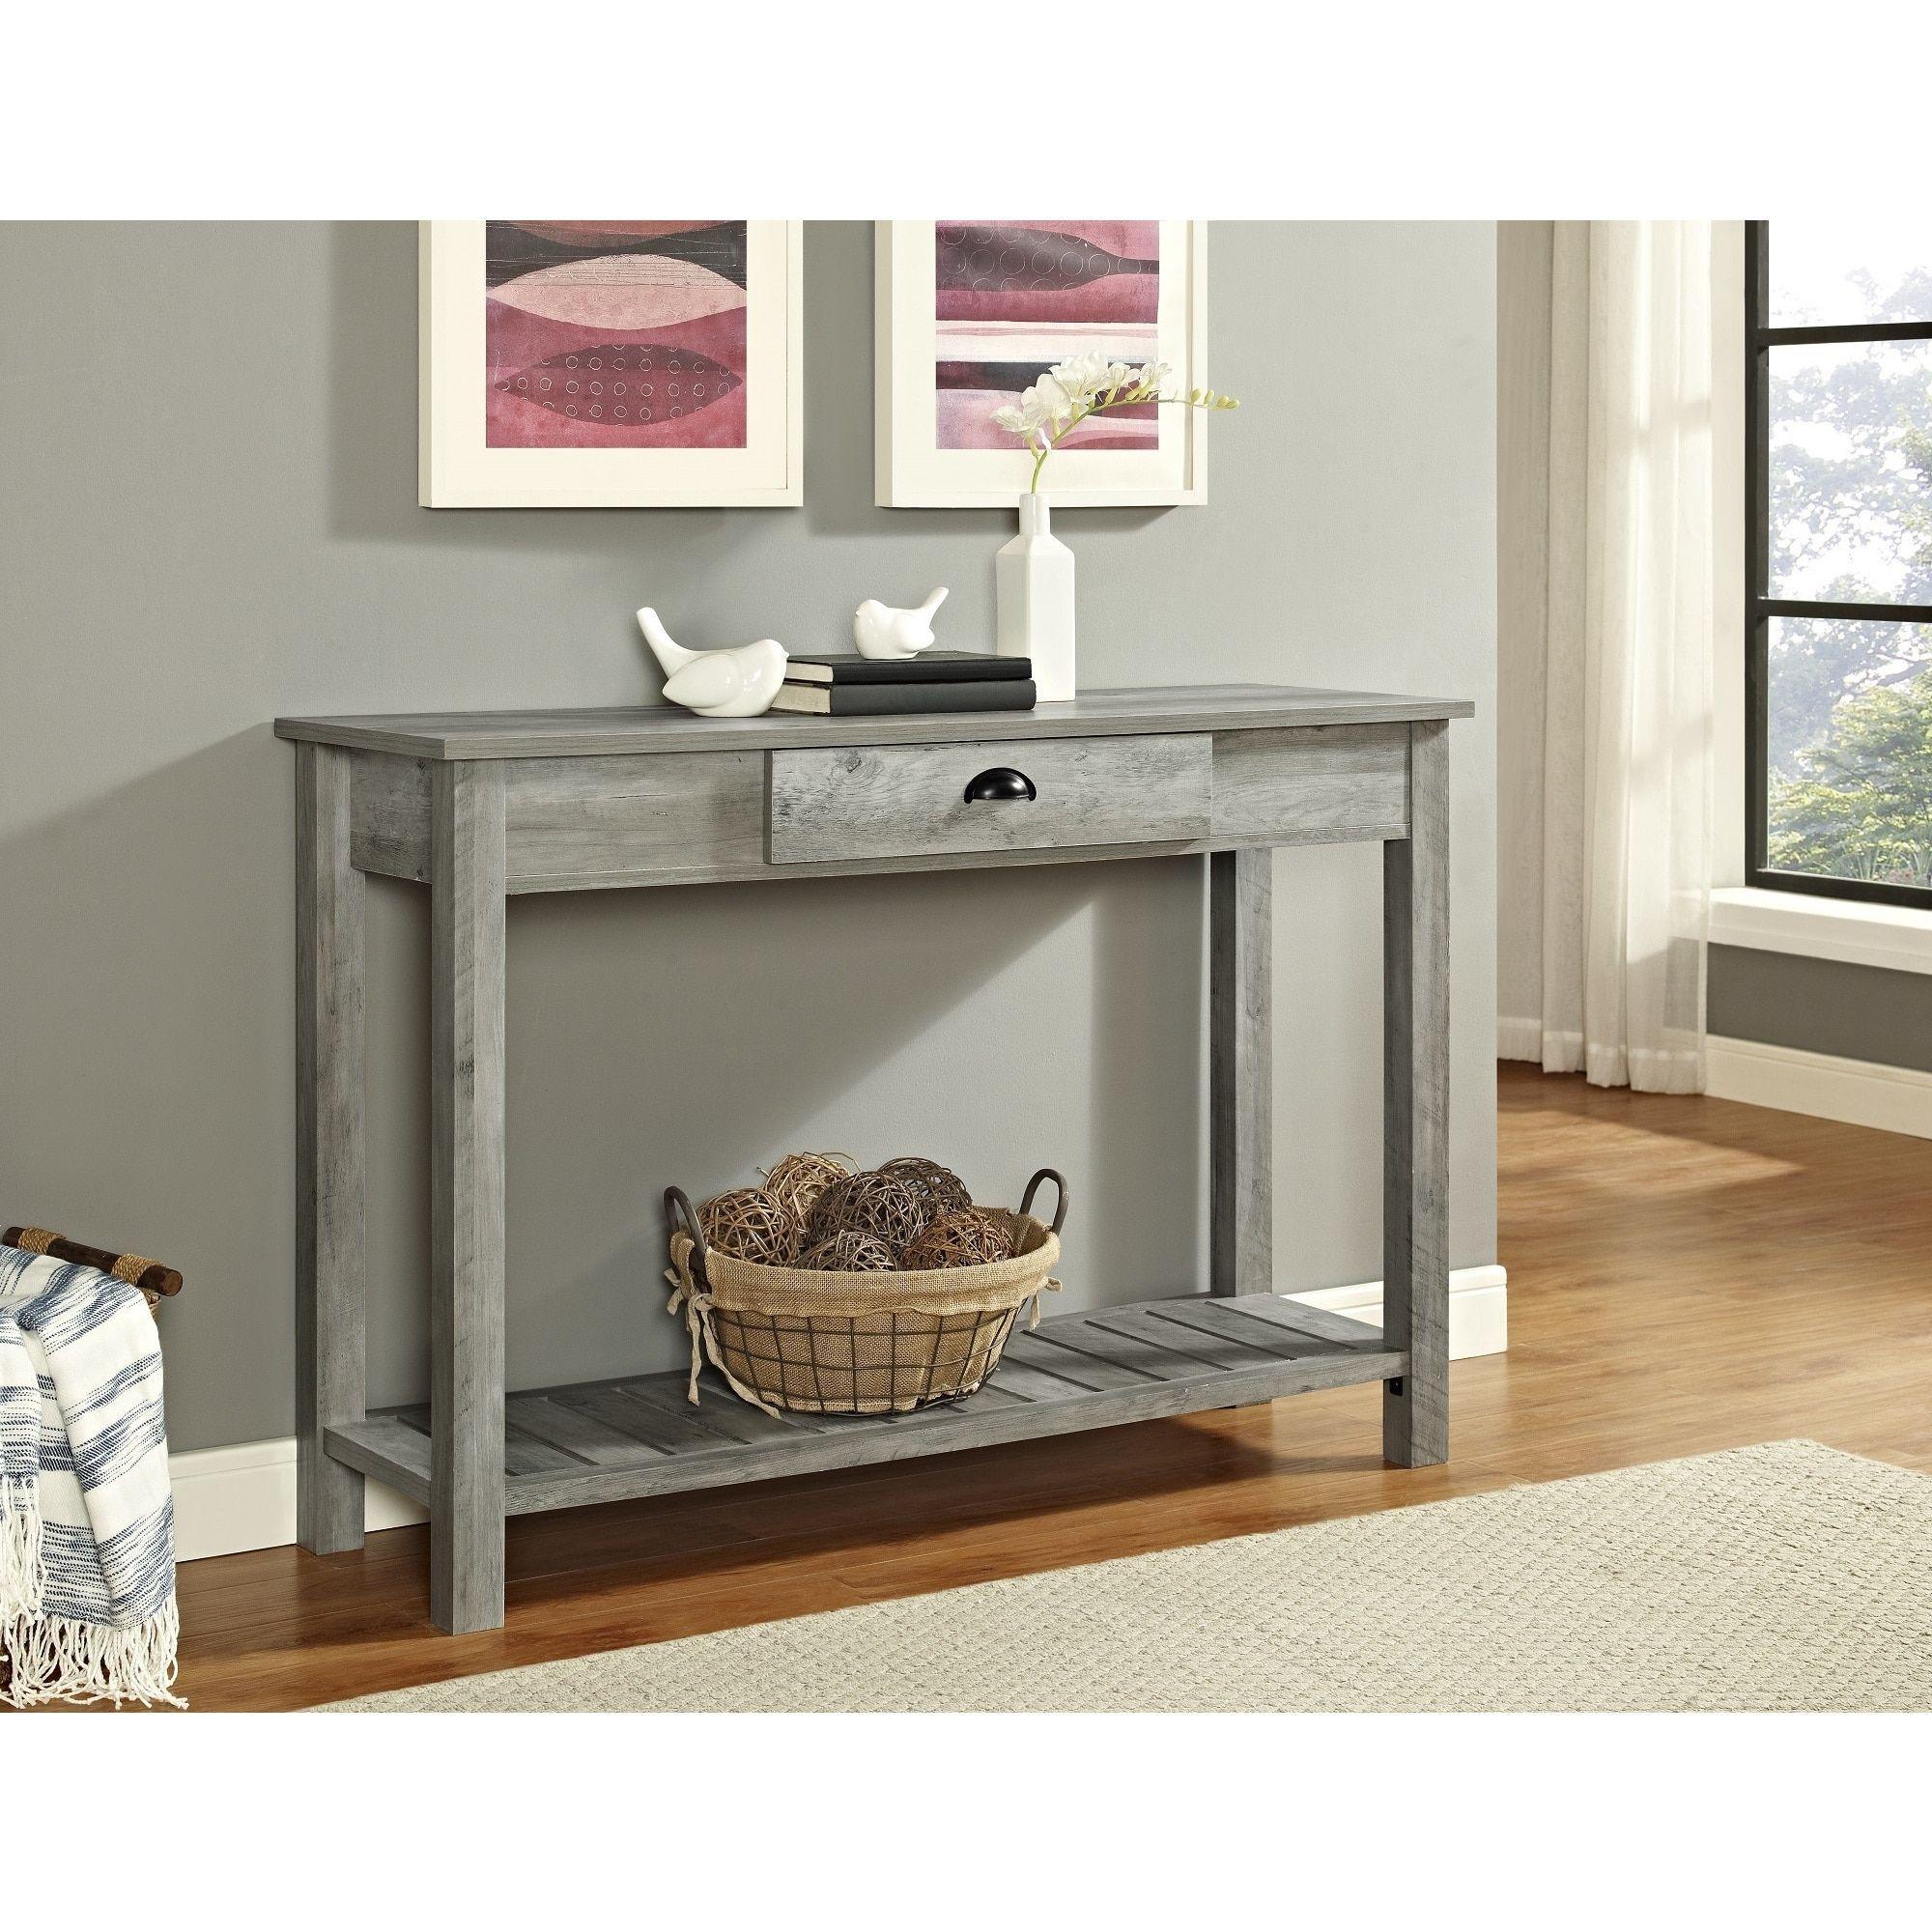 Superb 48 Entry Console Table 48 X 16 X 32H Grey Wash Gray Ibusinesslaw Wood Chair Design Ideas Ibusinesslaworg